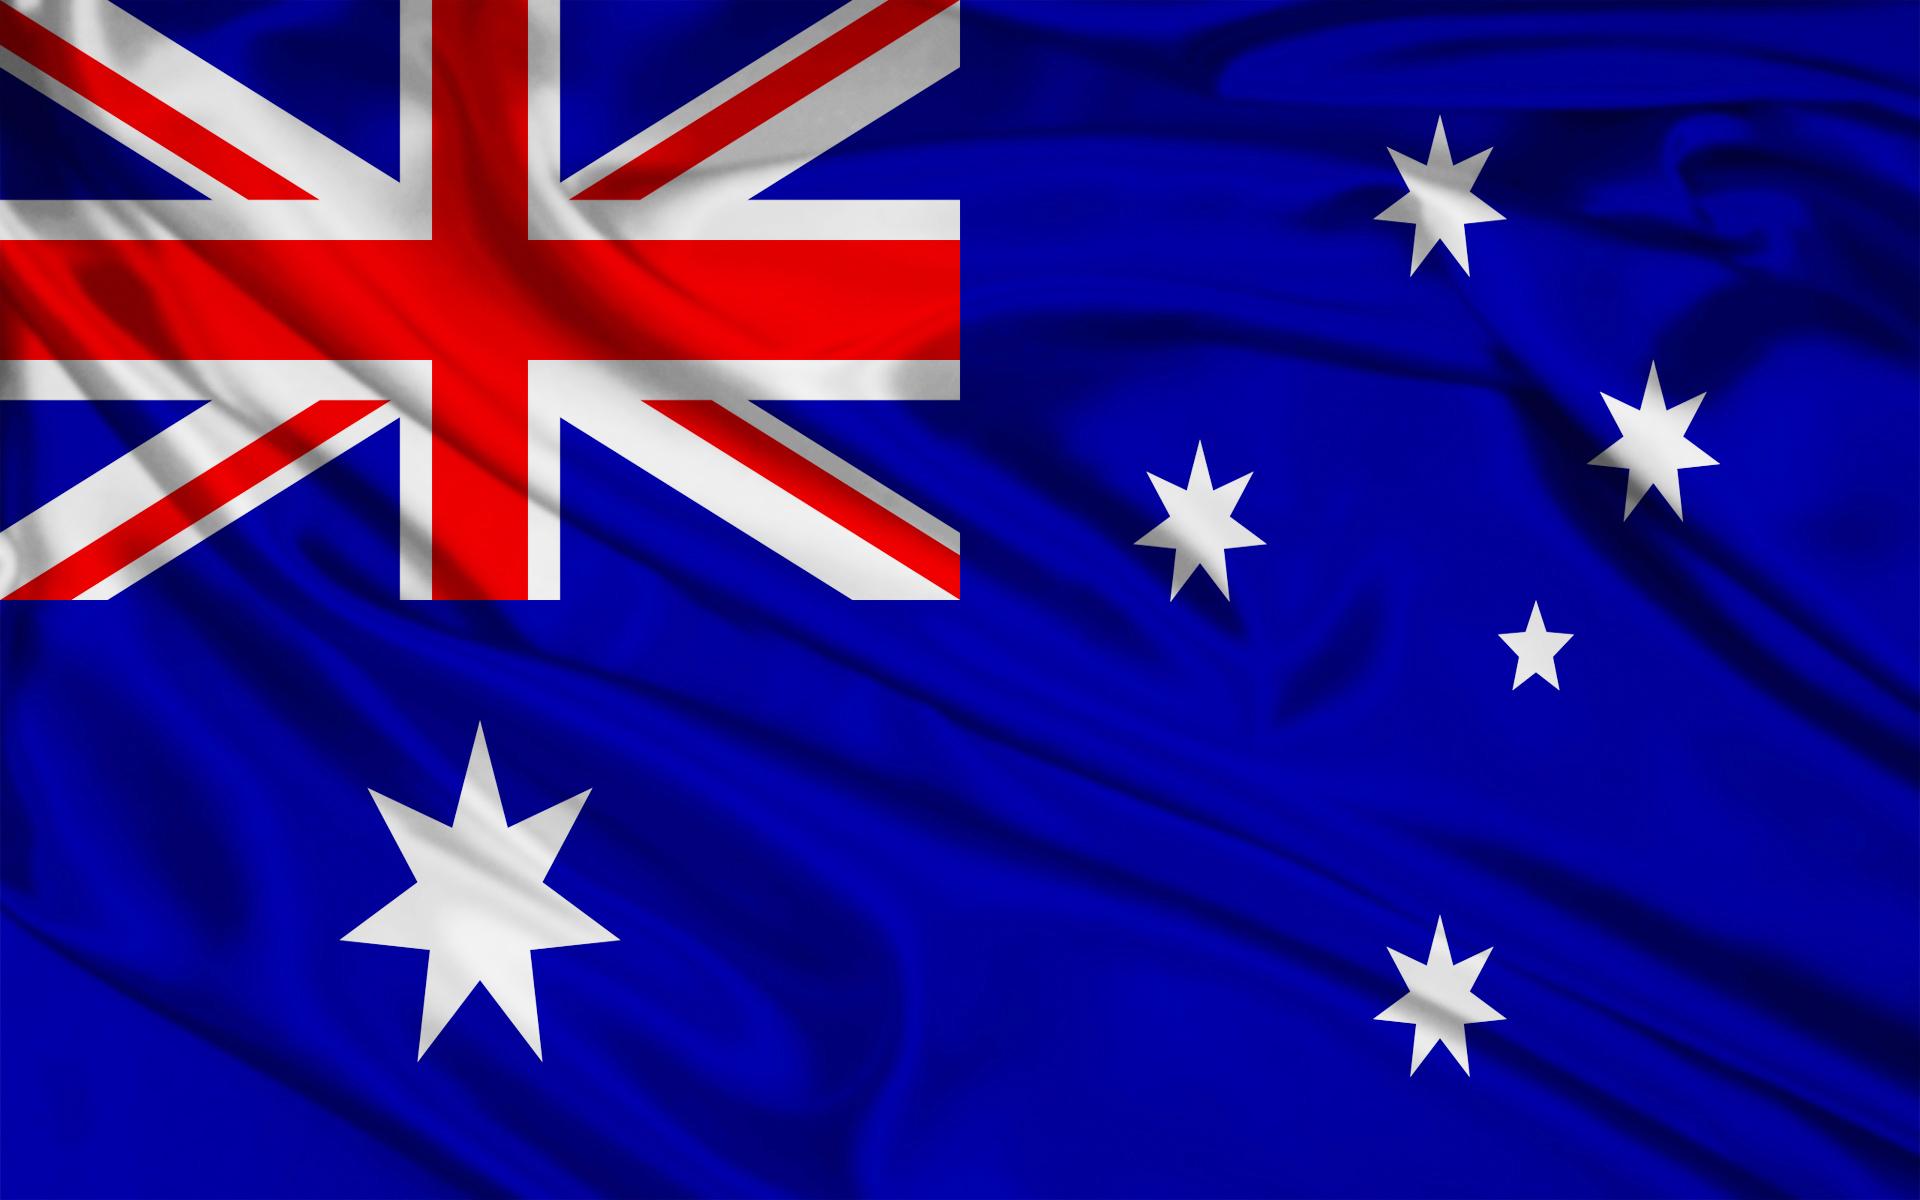 Australia Eagle Flag Wallpaper #3653 Wallpaper computer | best ...